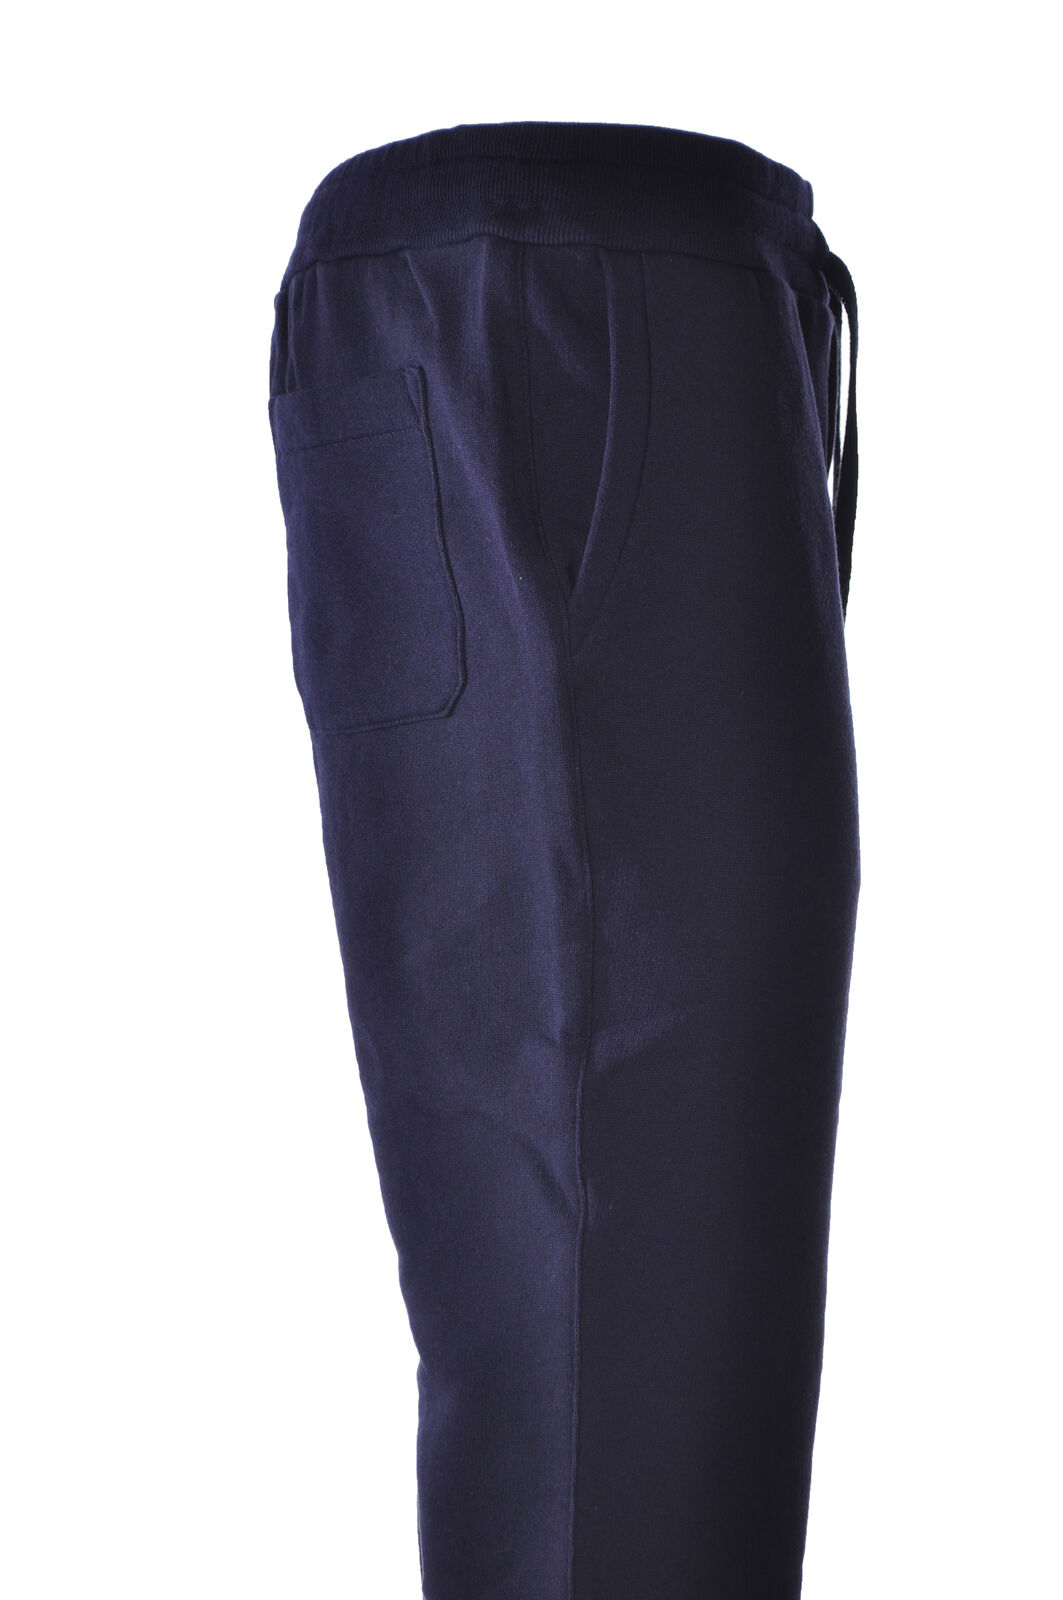 CROSSLEY - Pants-Shorts-sweatshirt - Man - bluee - 4097423C183804